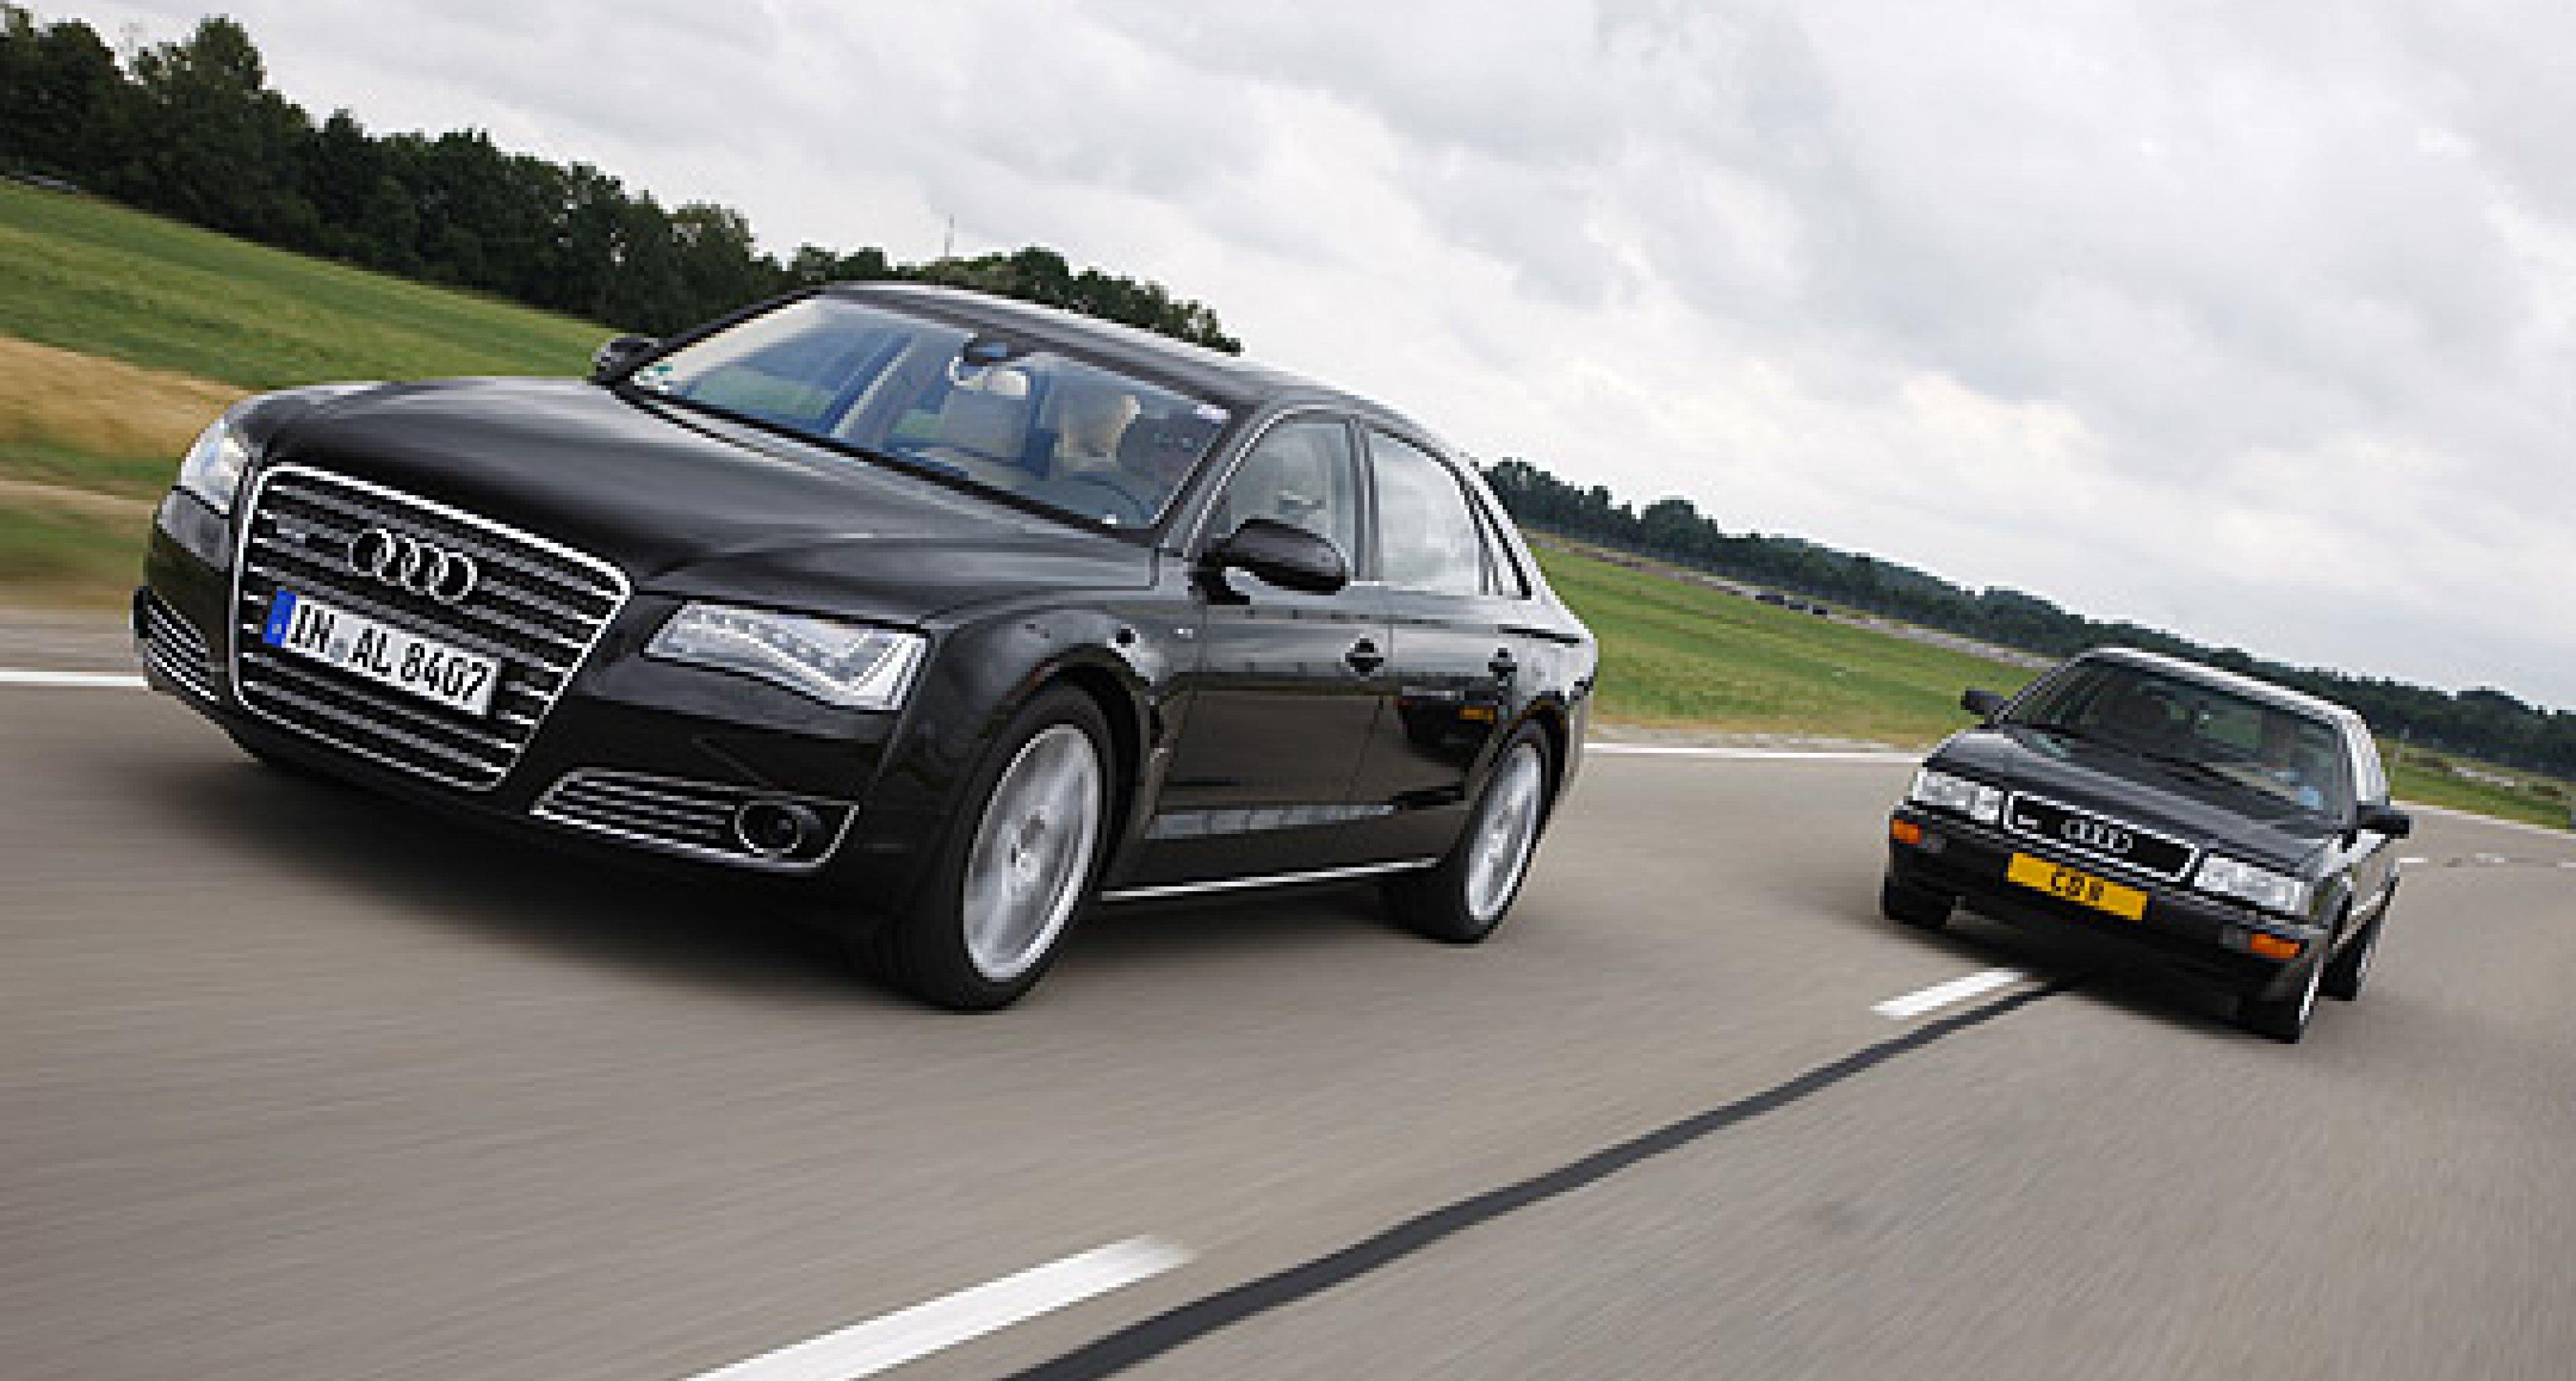 Audi A8 W12 lang vs. Audi V8 4,2L: Das Maß der Ringe